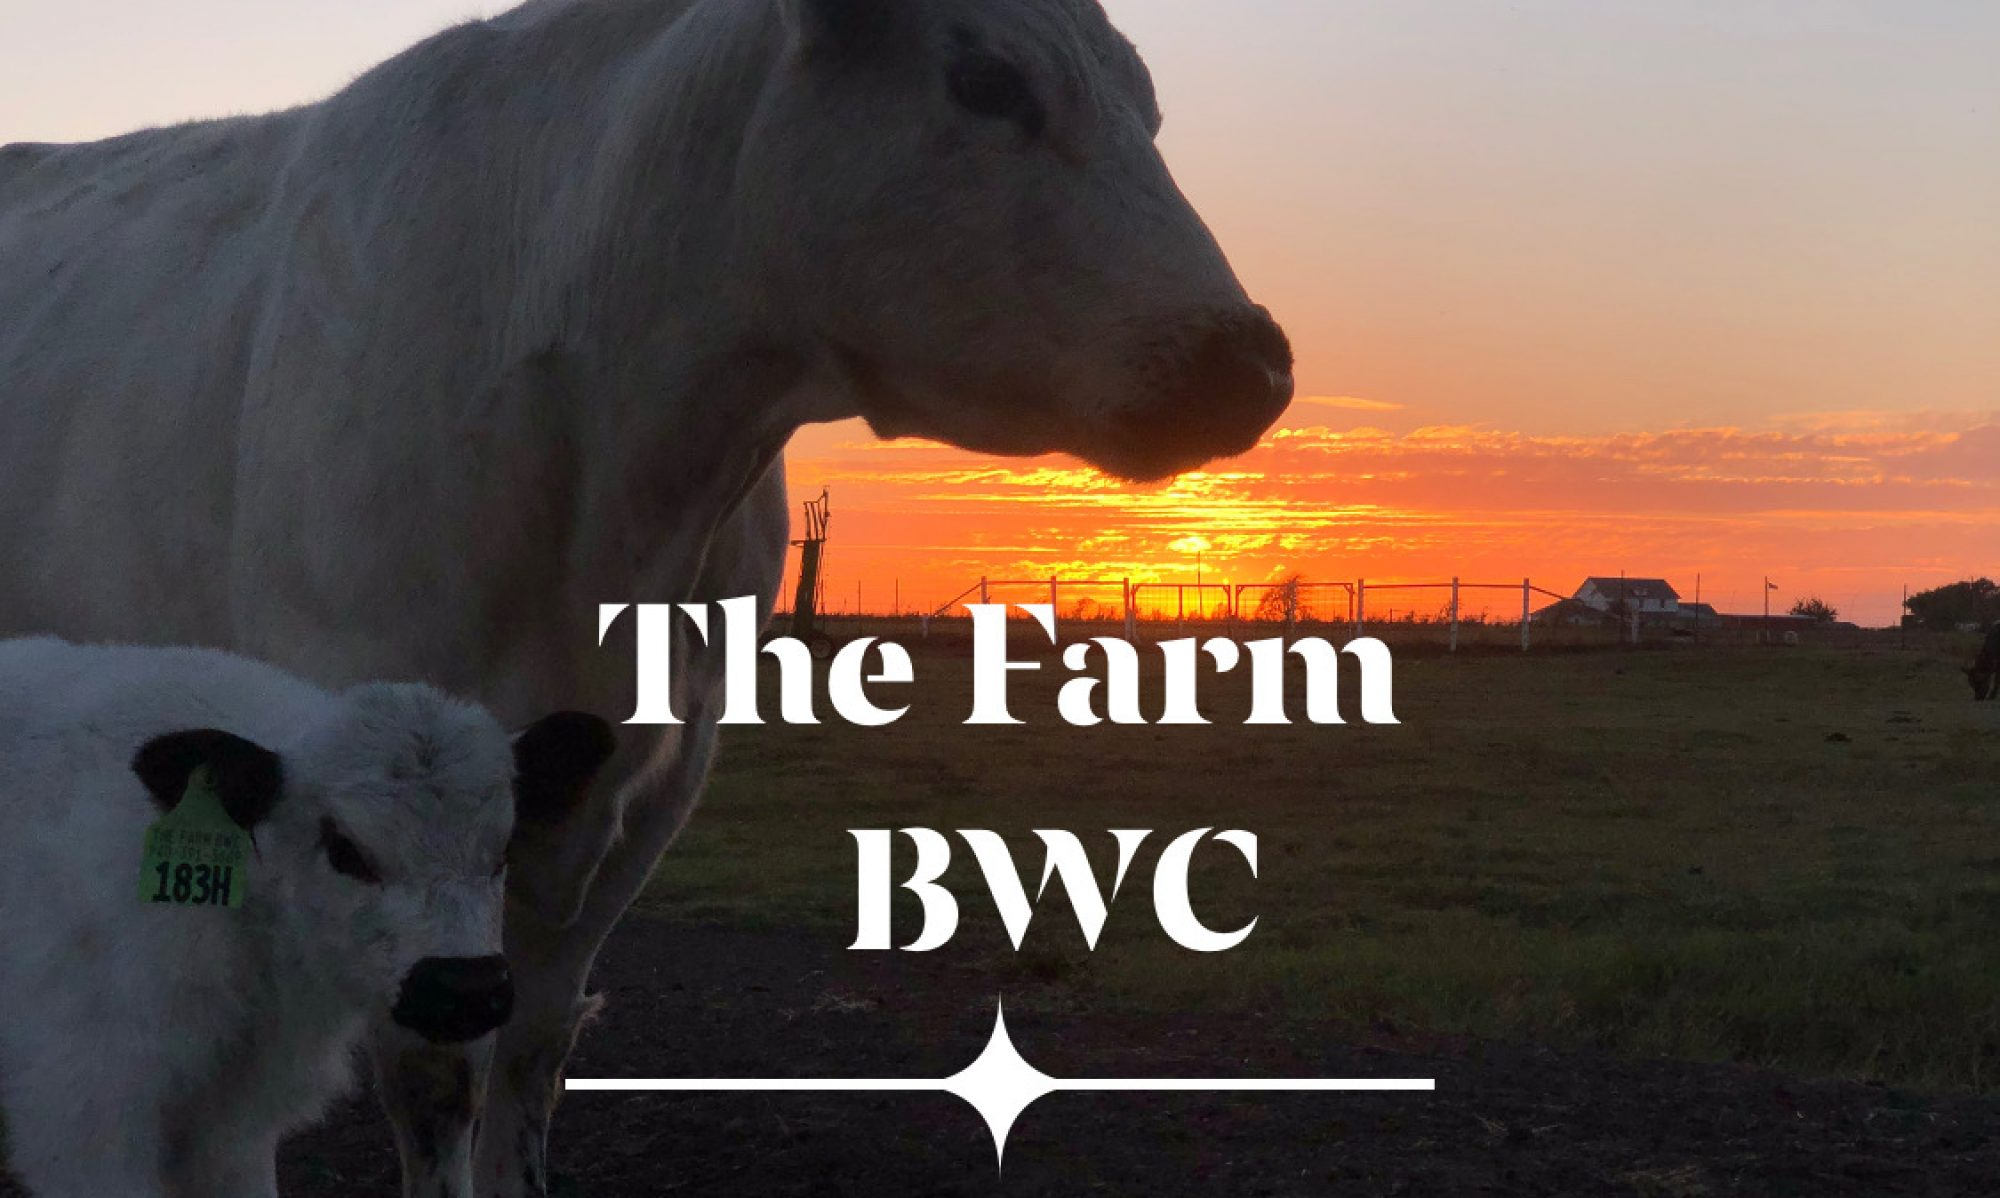 The Farm British White Cattle